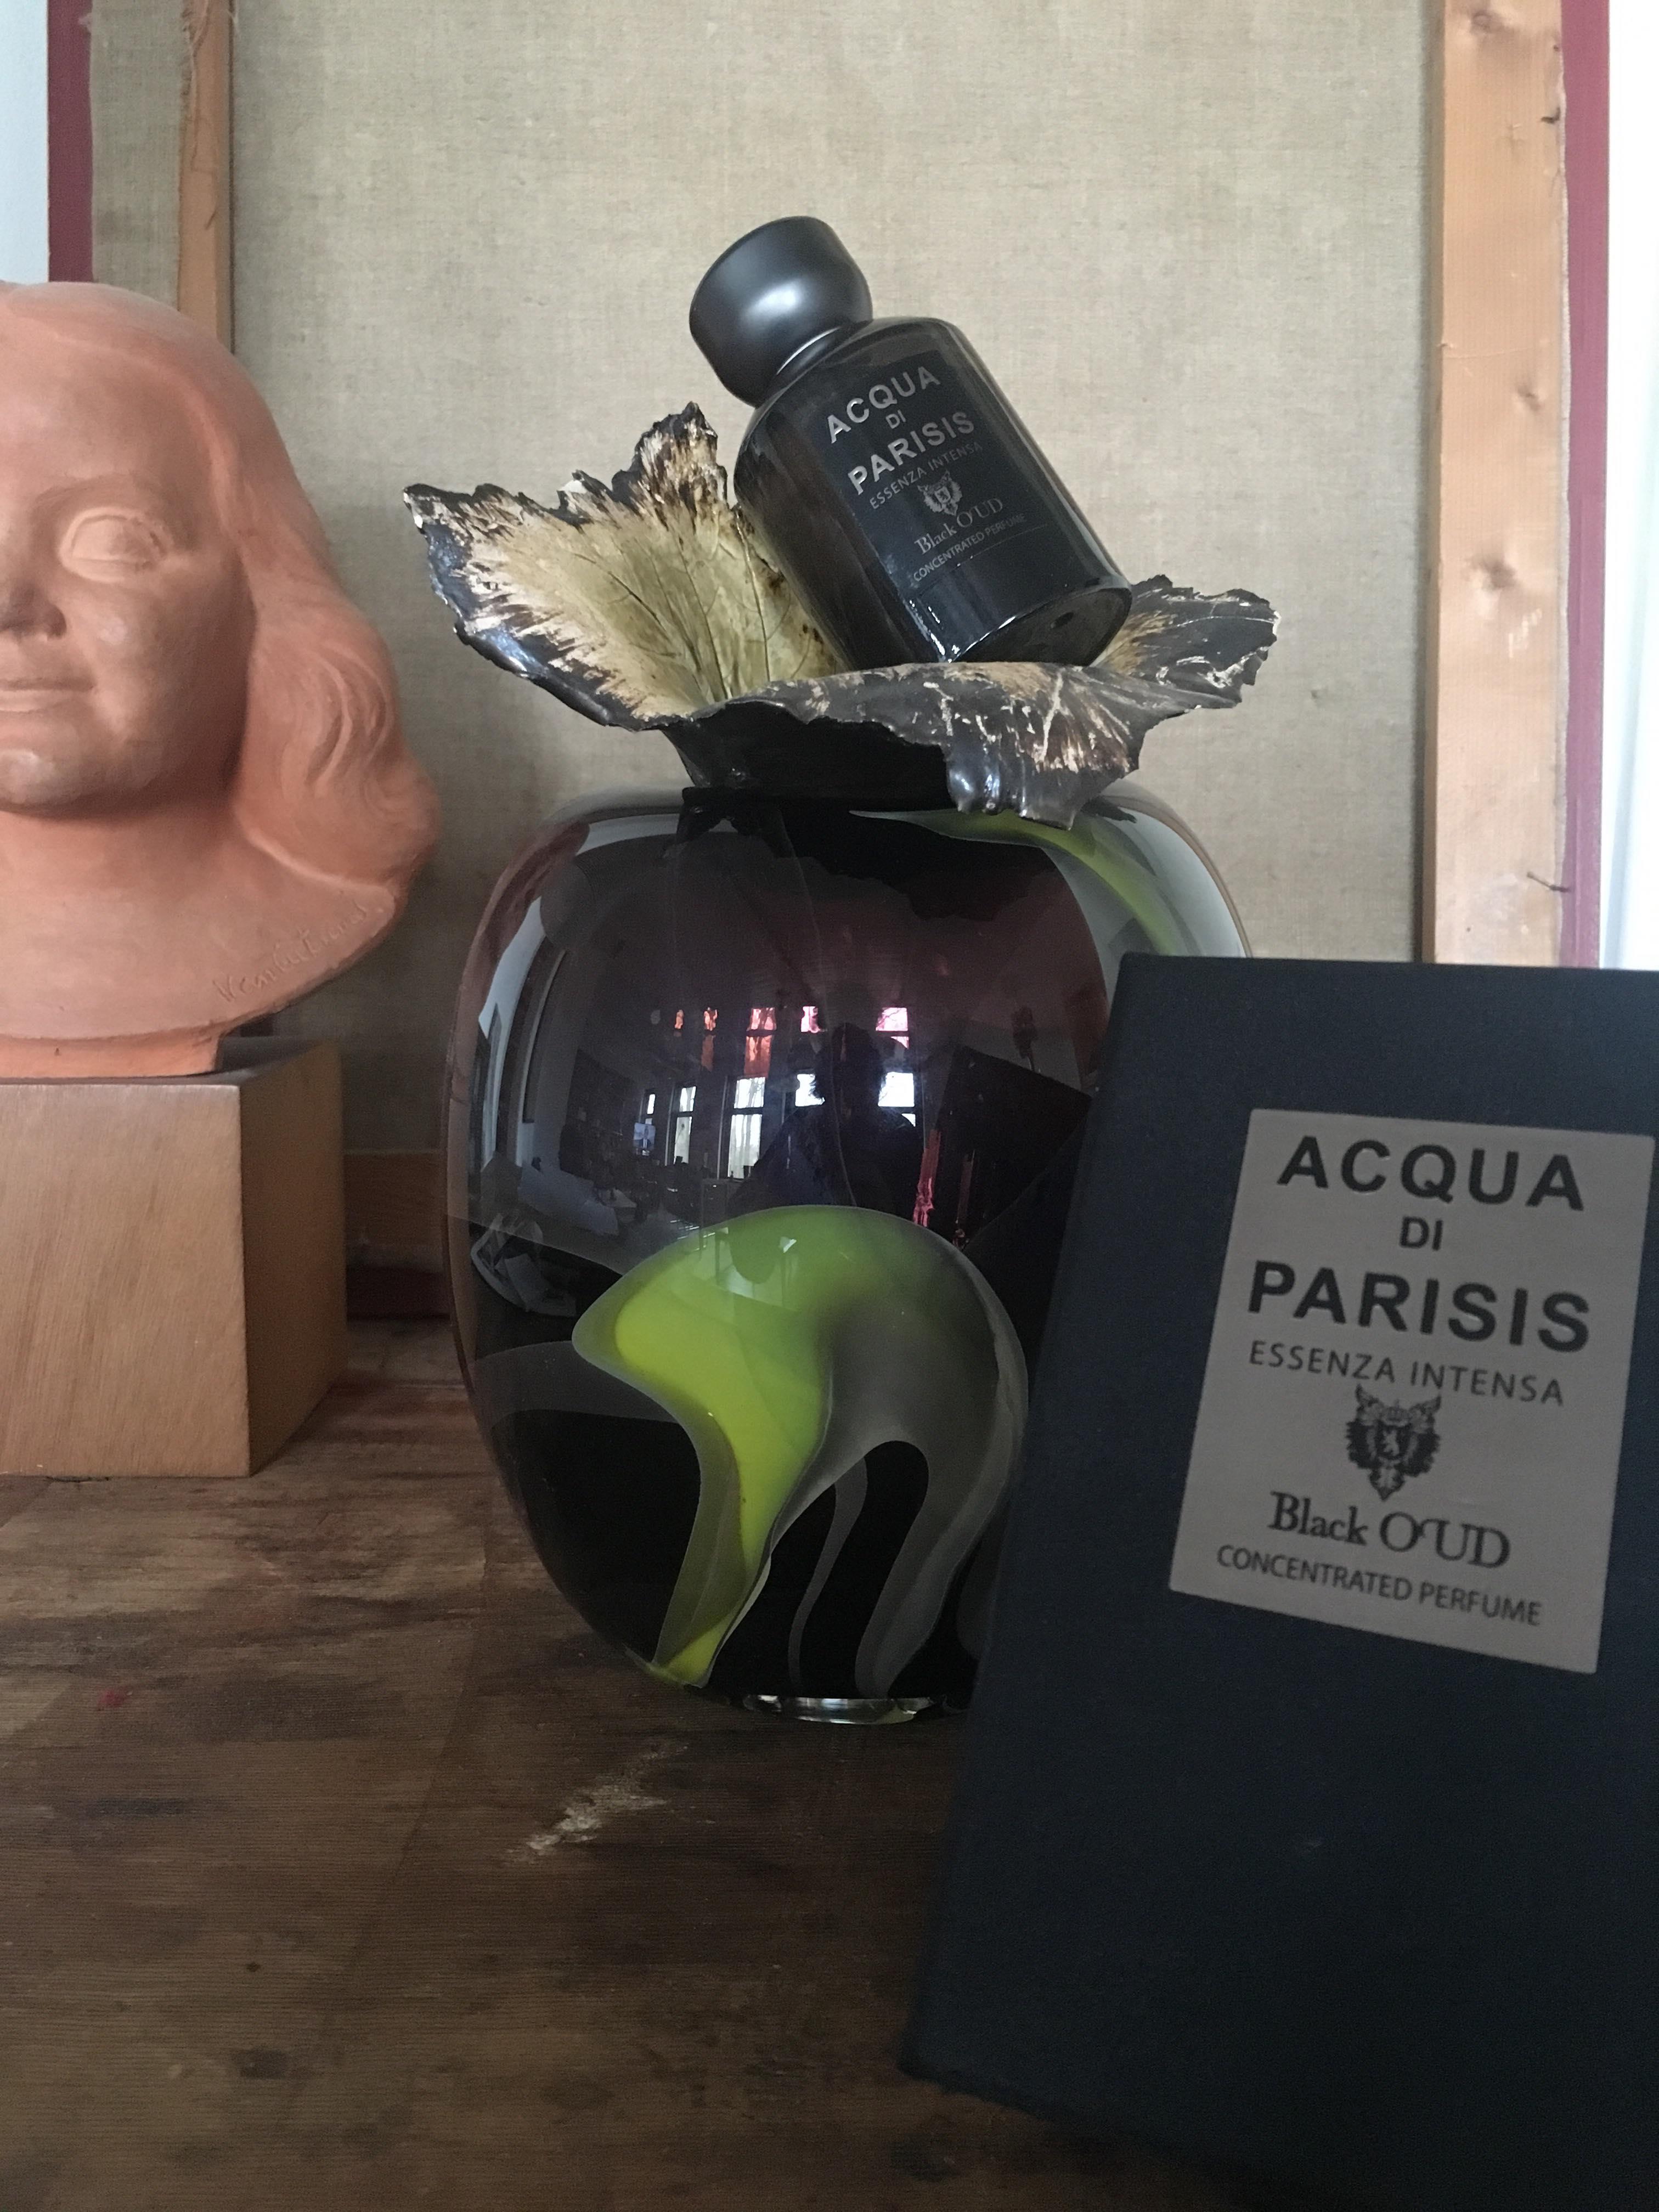 BLACK OUD ACQUA DI PARISIS MOOD 1